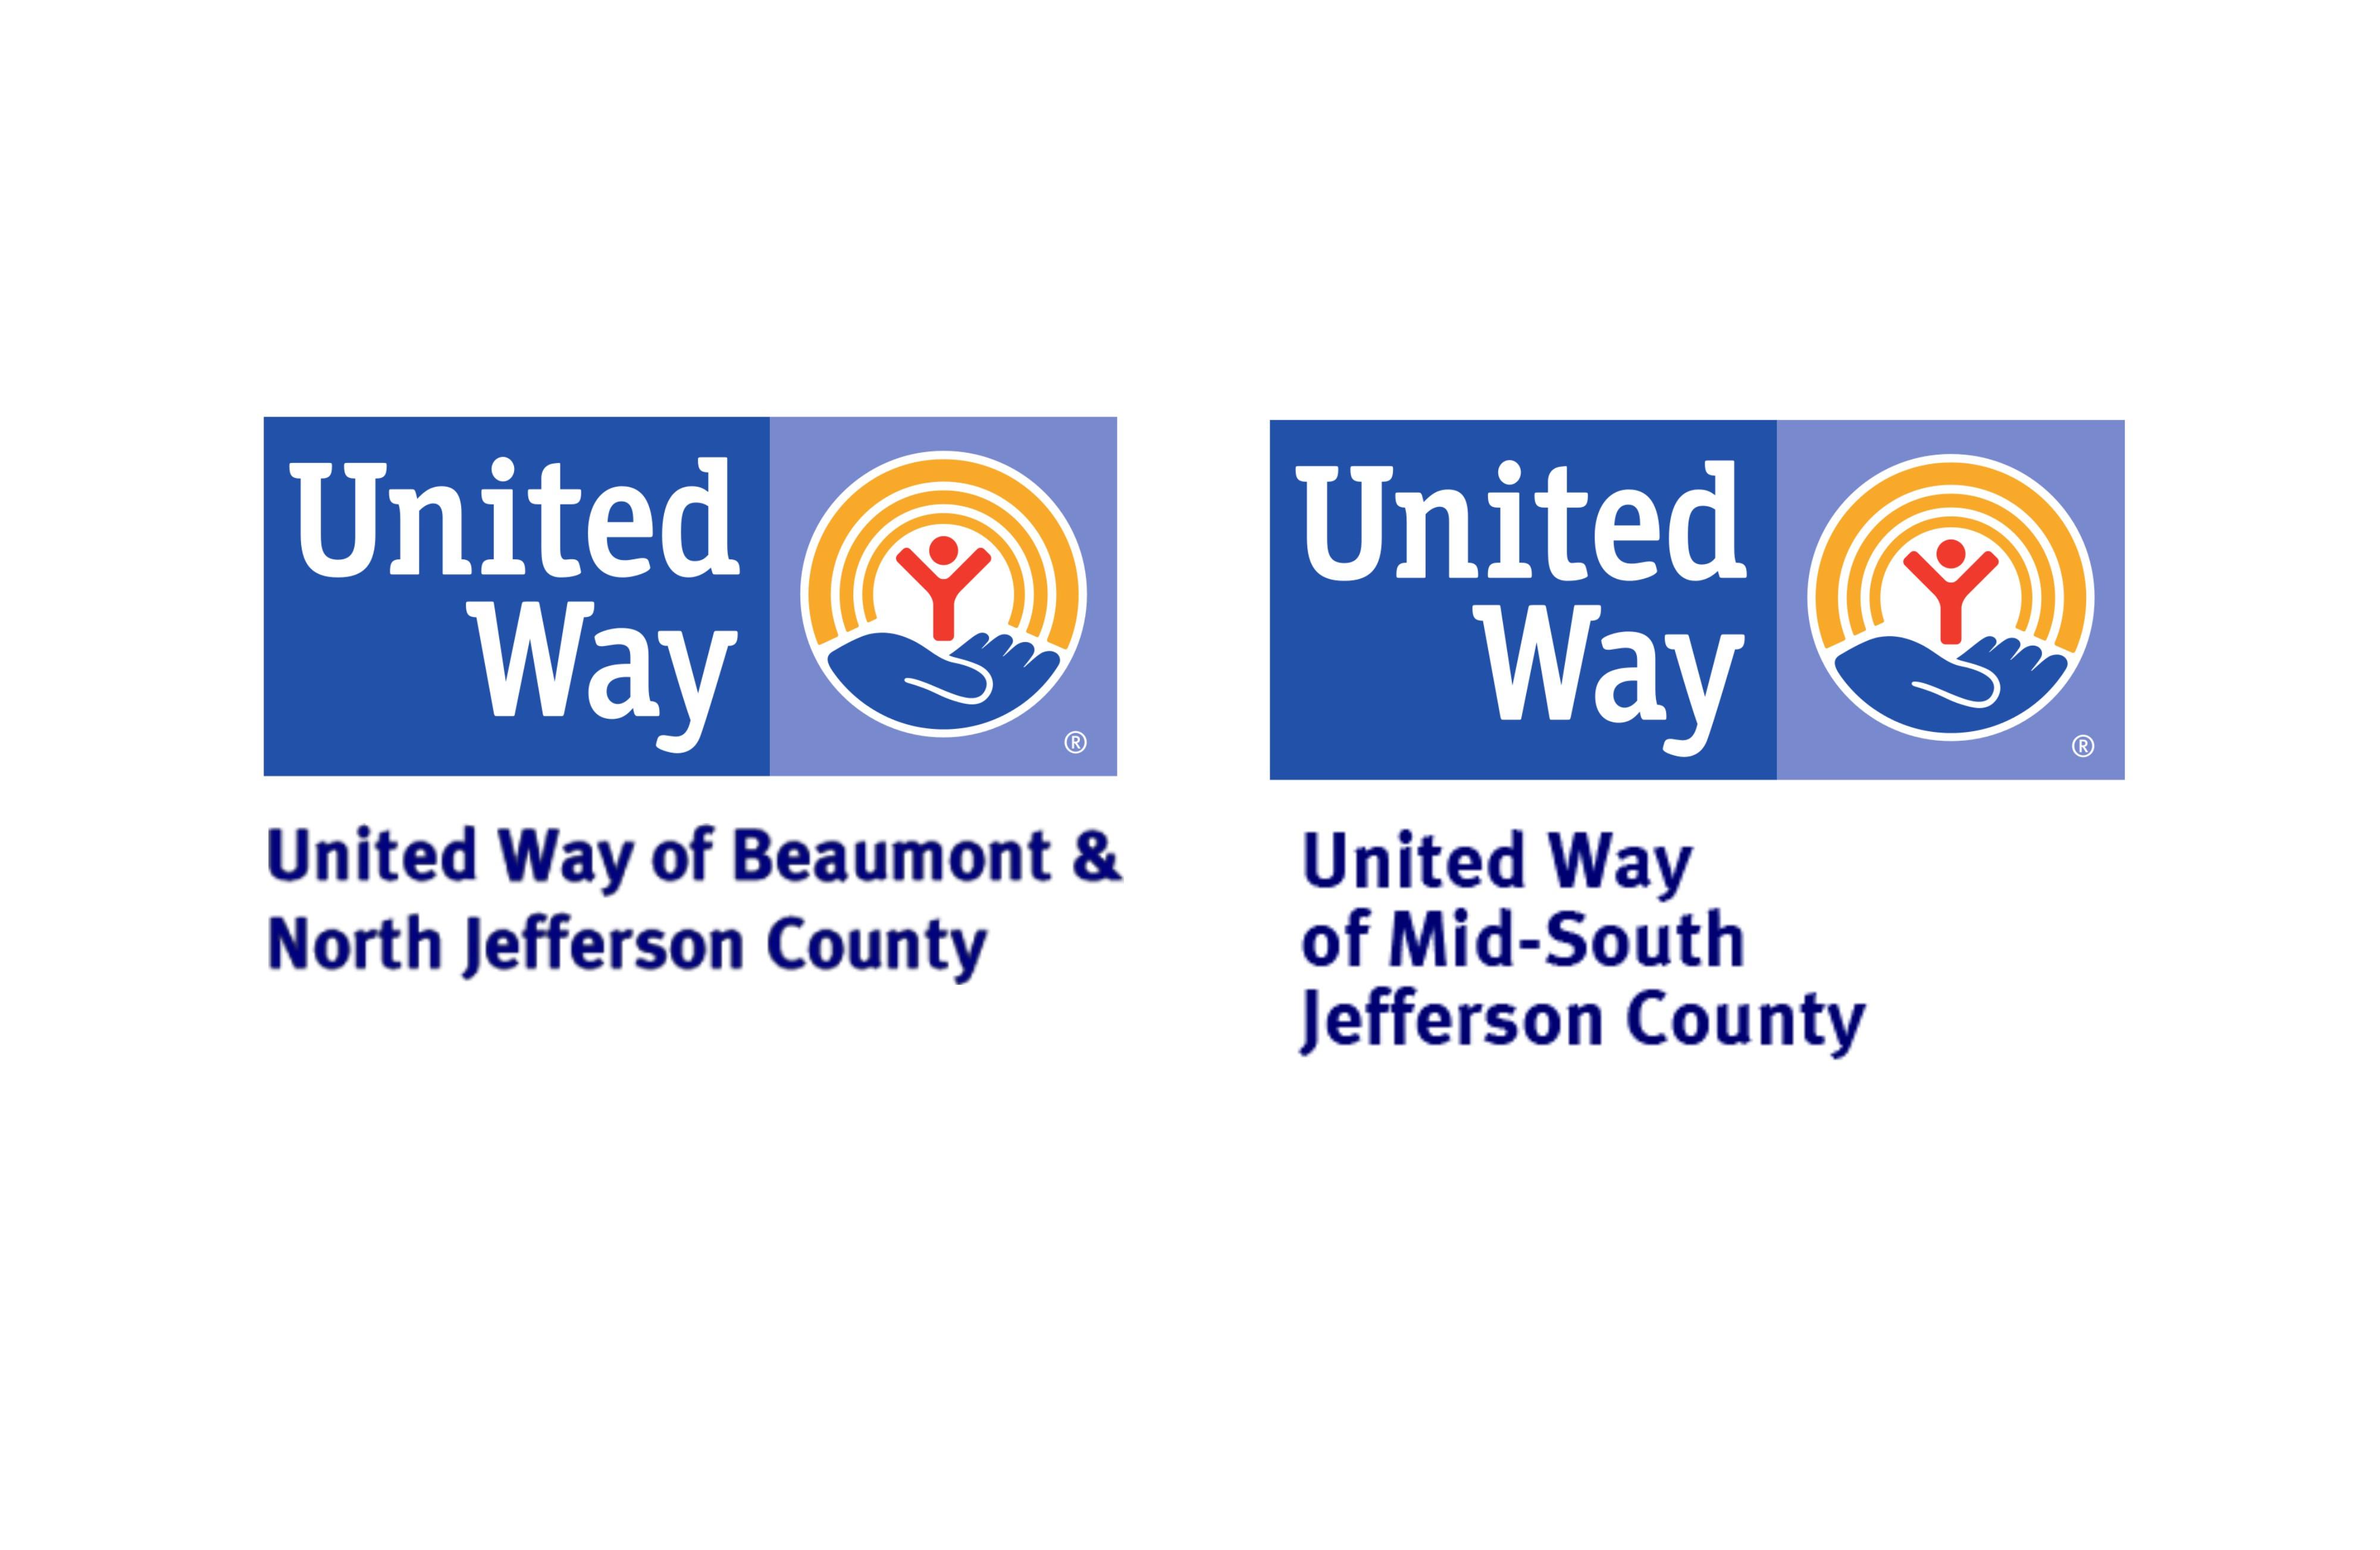 United Way B